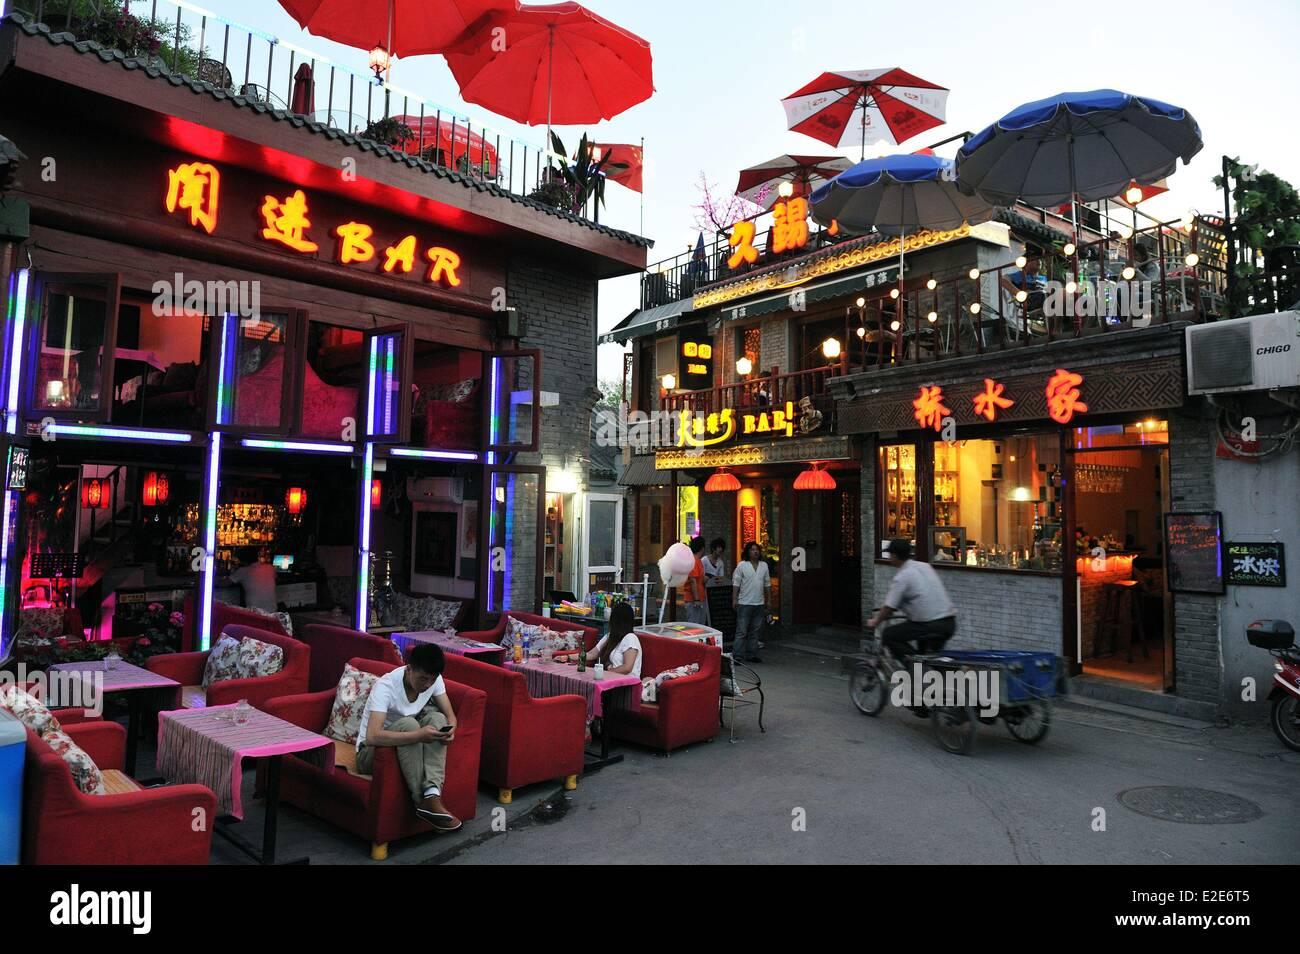 China, Beijing, Xicheng district, nightlife around the Silver bar bridge between the Houhai lake and the Qianhai - Stock Image